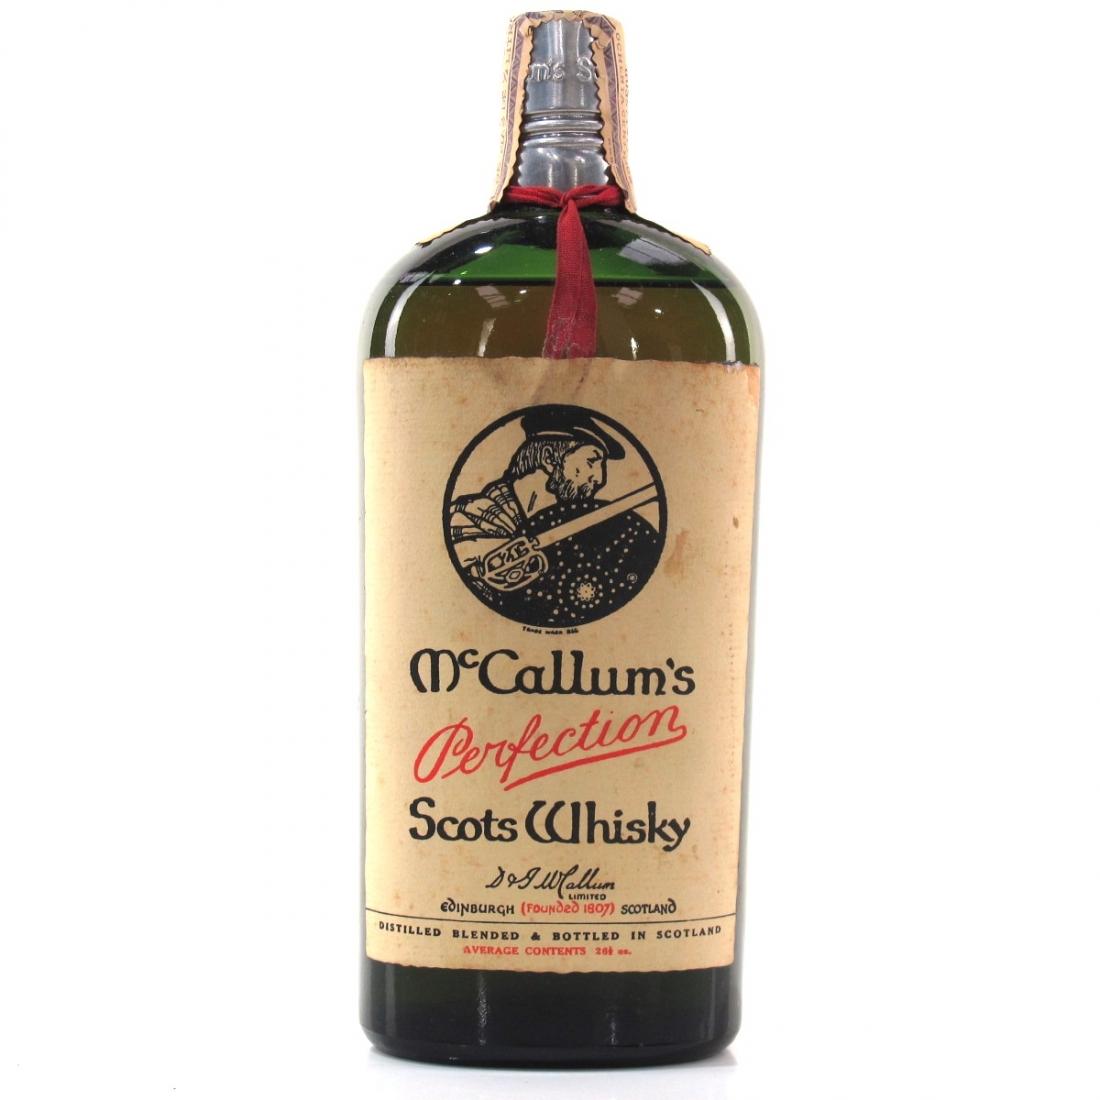 McCallum's Perfection Scots Whisky 1970s